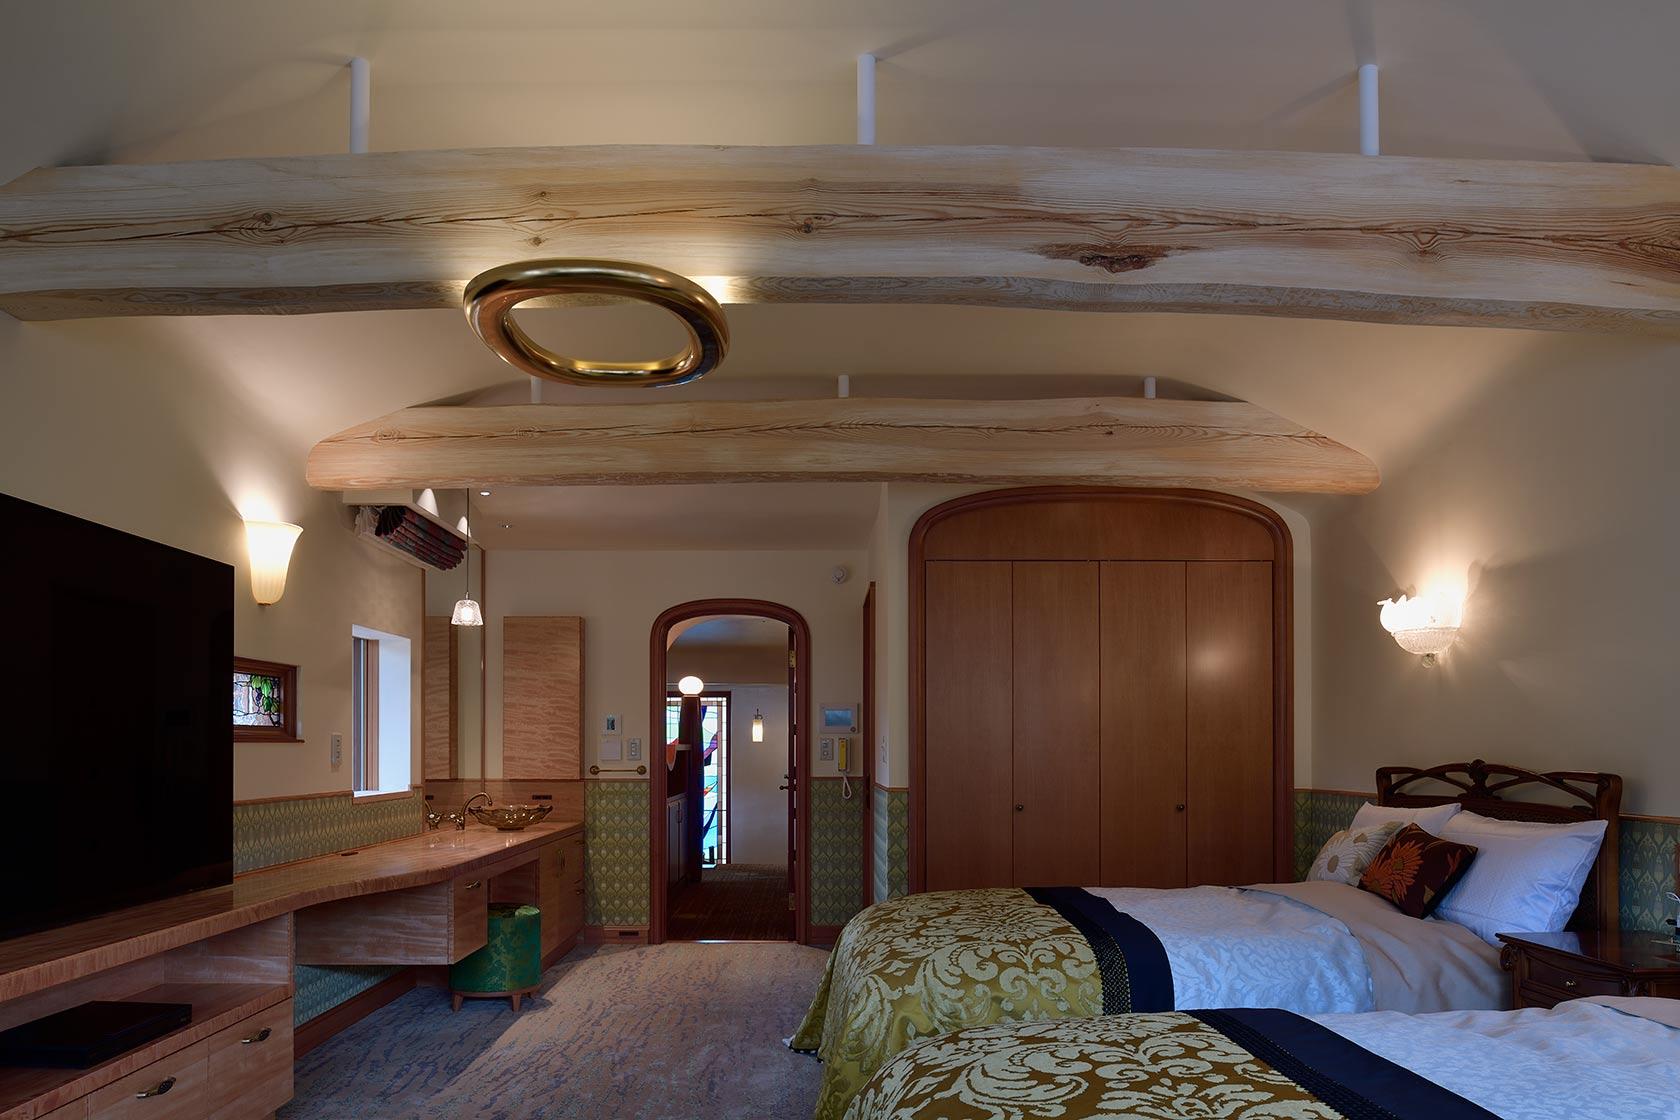 A邸34-寝室